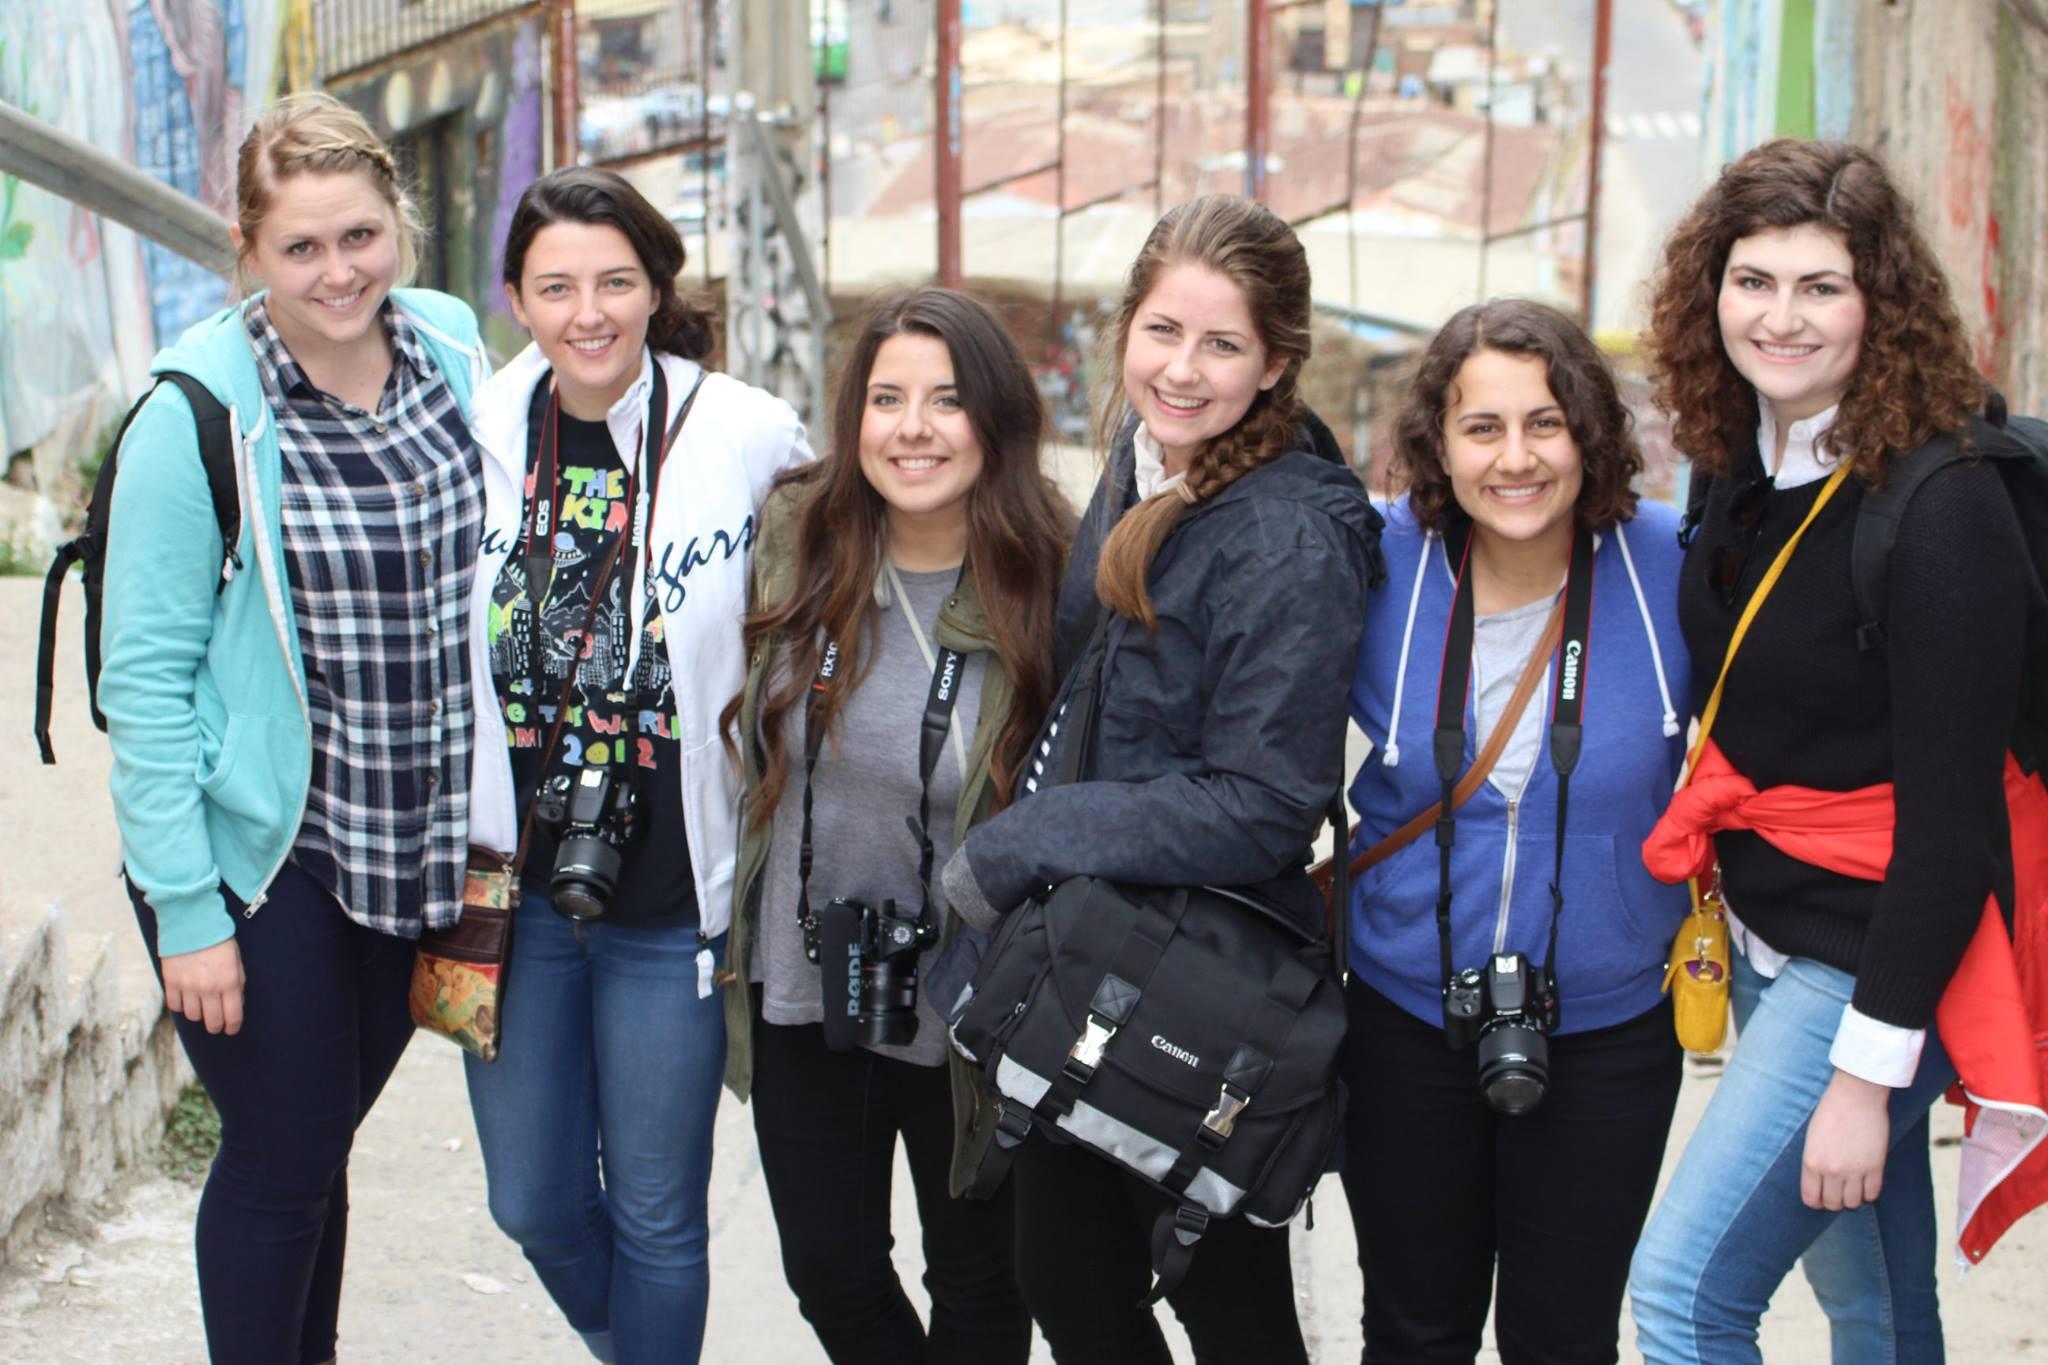 Students in Chile. From left to right: Jaylen Bohman, Liesl Nielsen, Victoria Estrada, Kjersten Johnson, Jasmine Harouny and Cassidy Hansen